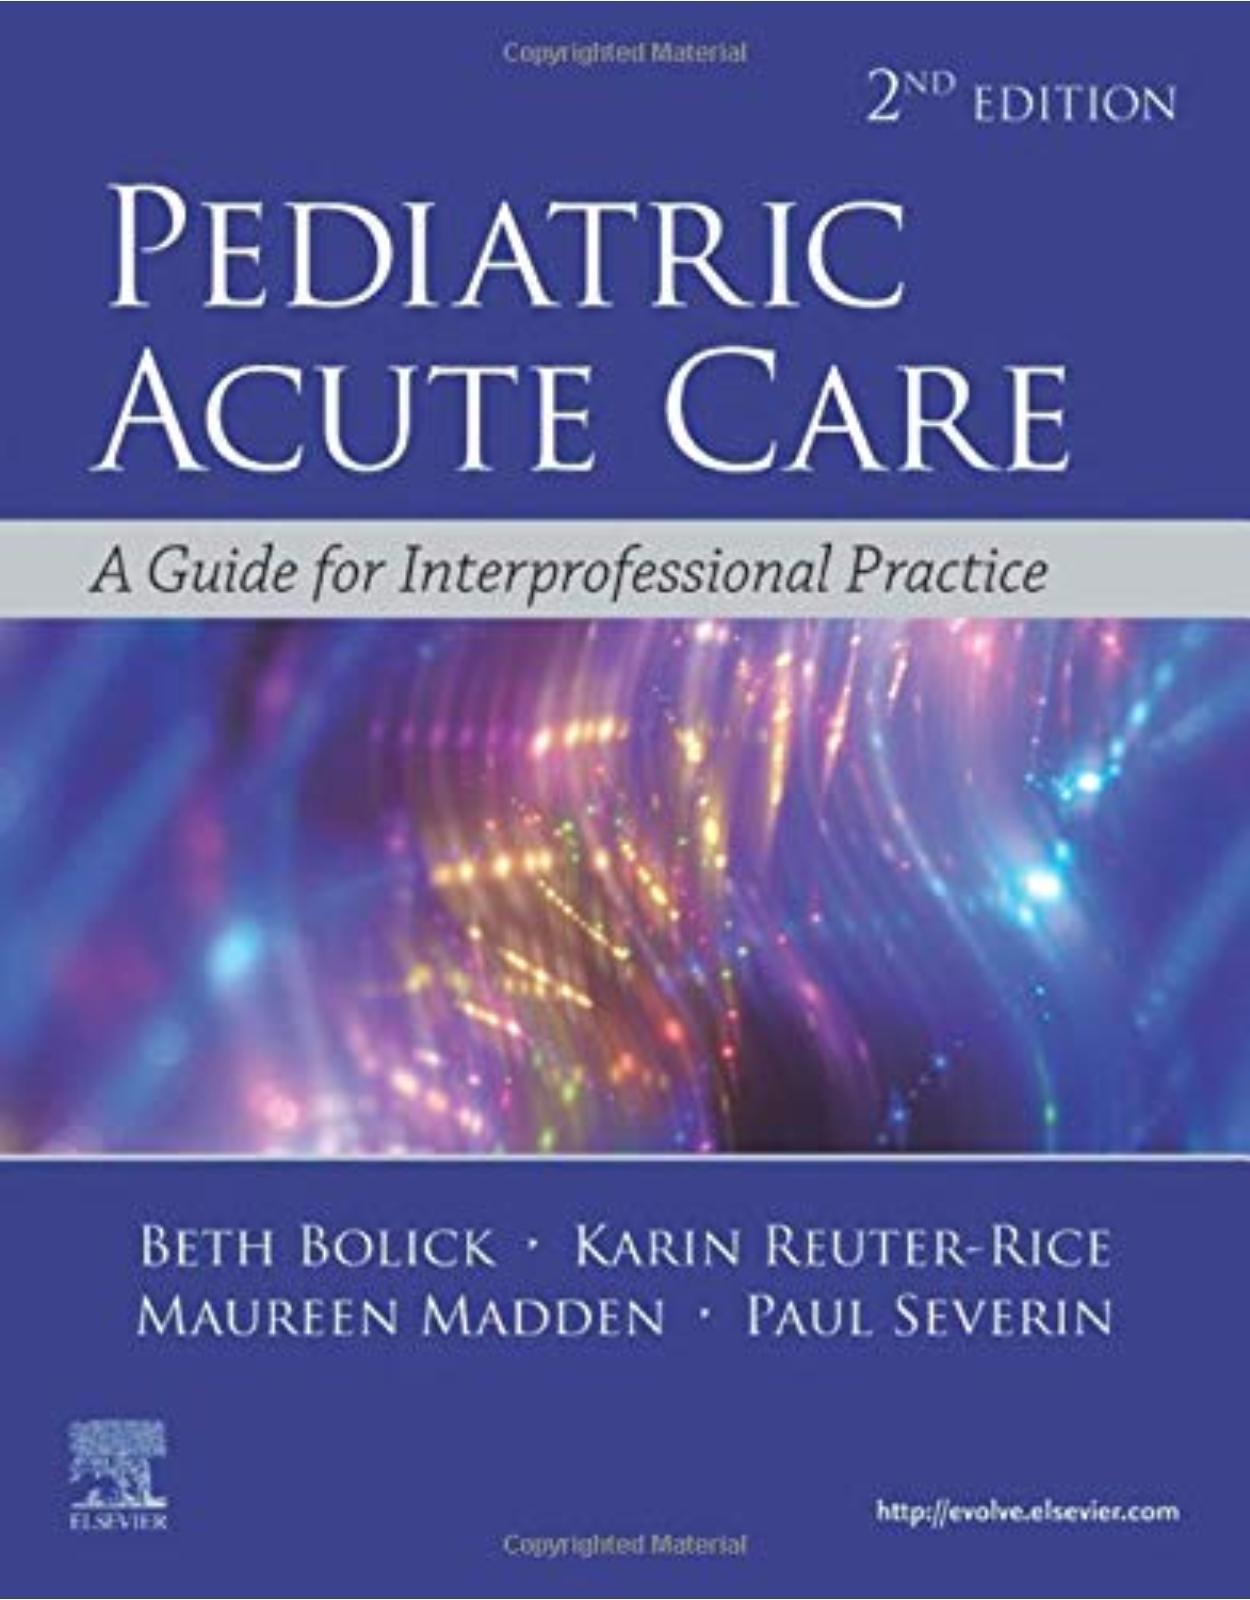 Pediatric Acute Care: A Guide to Interprofessional Practice